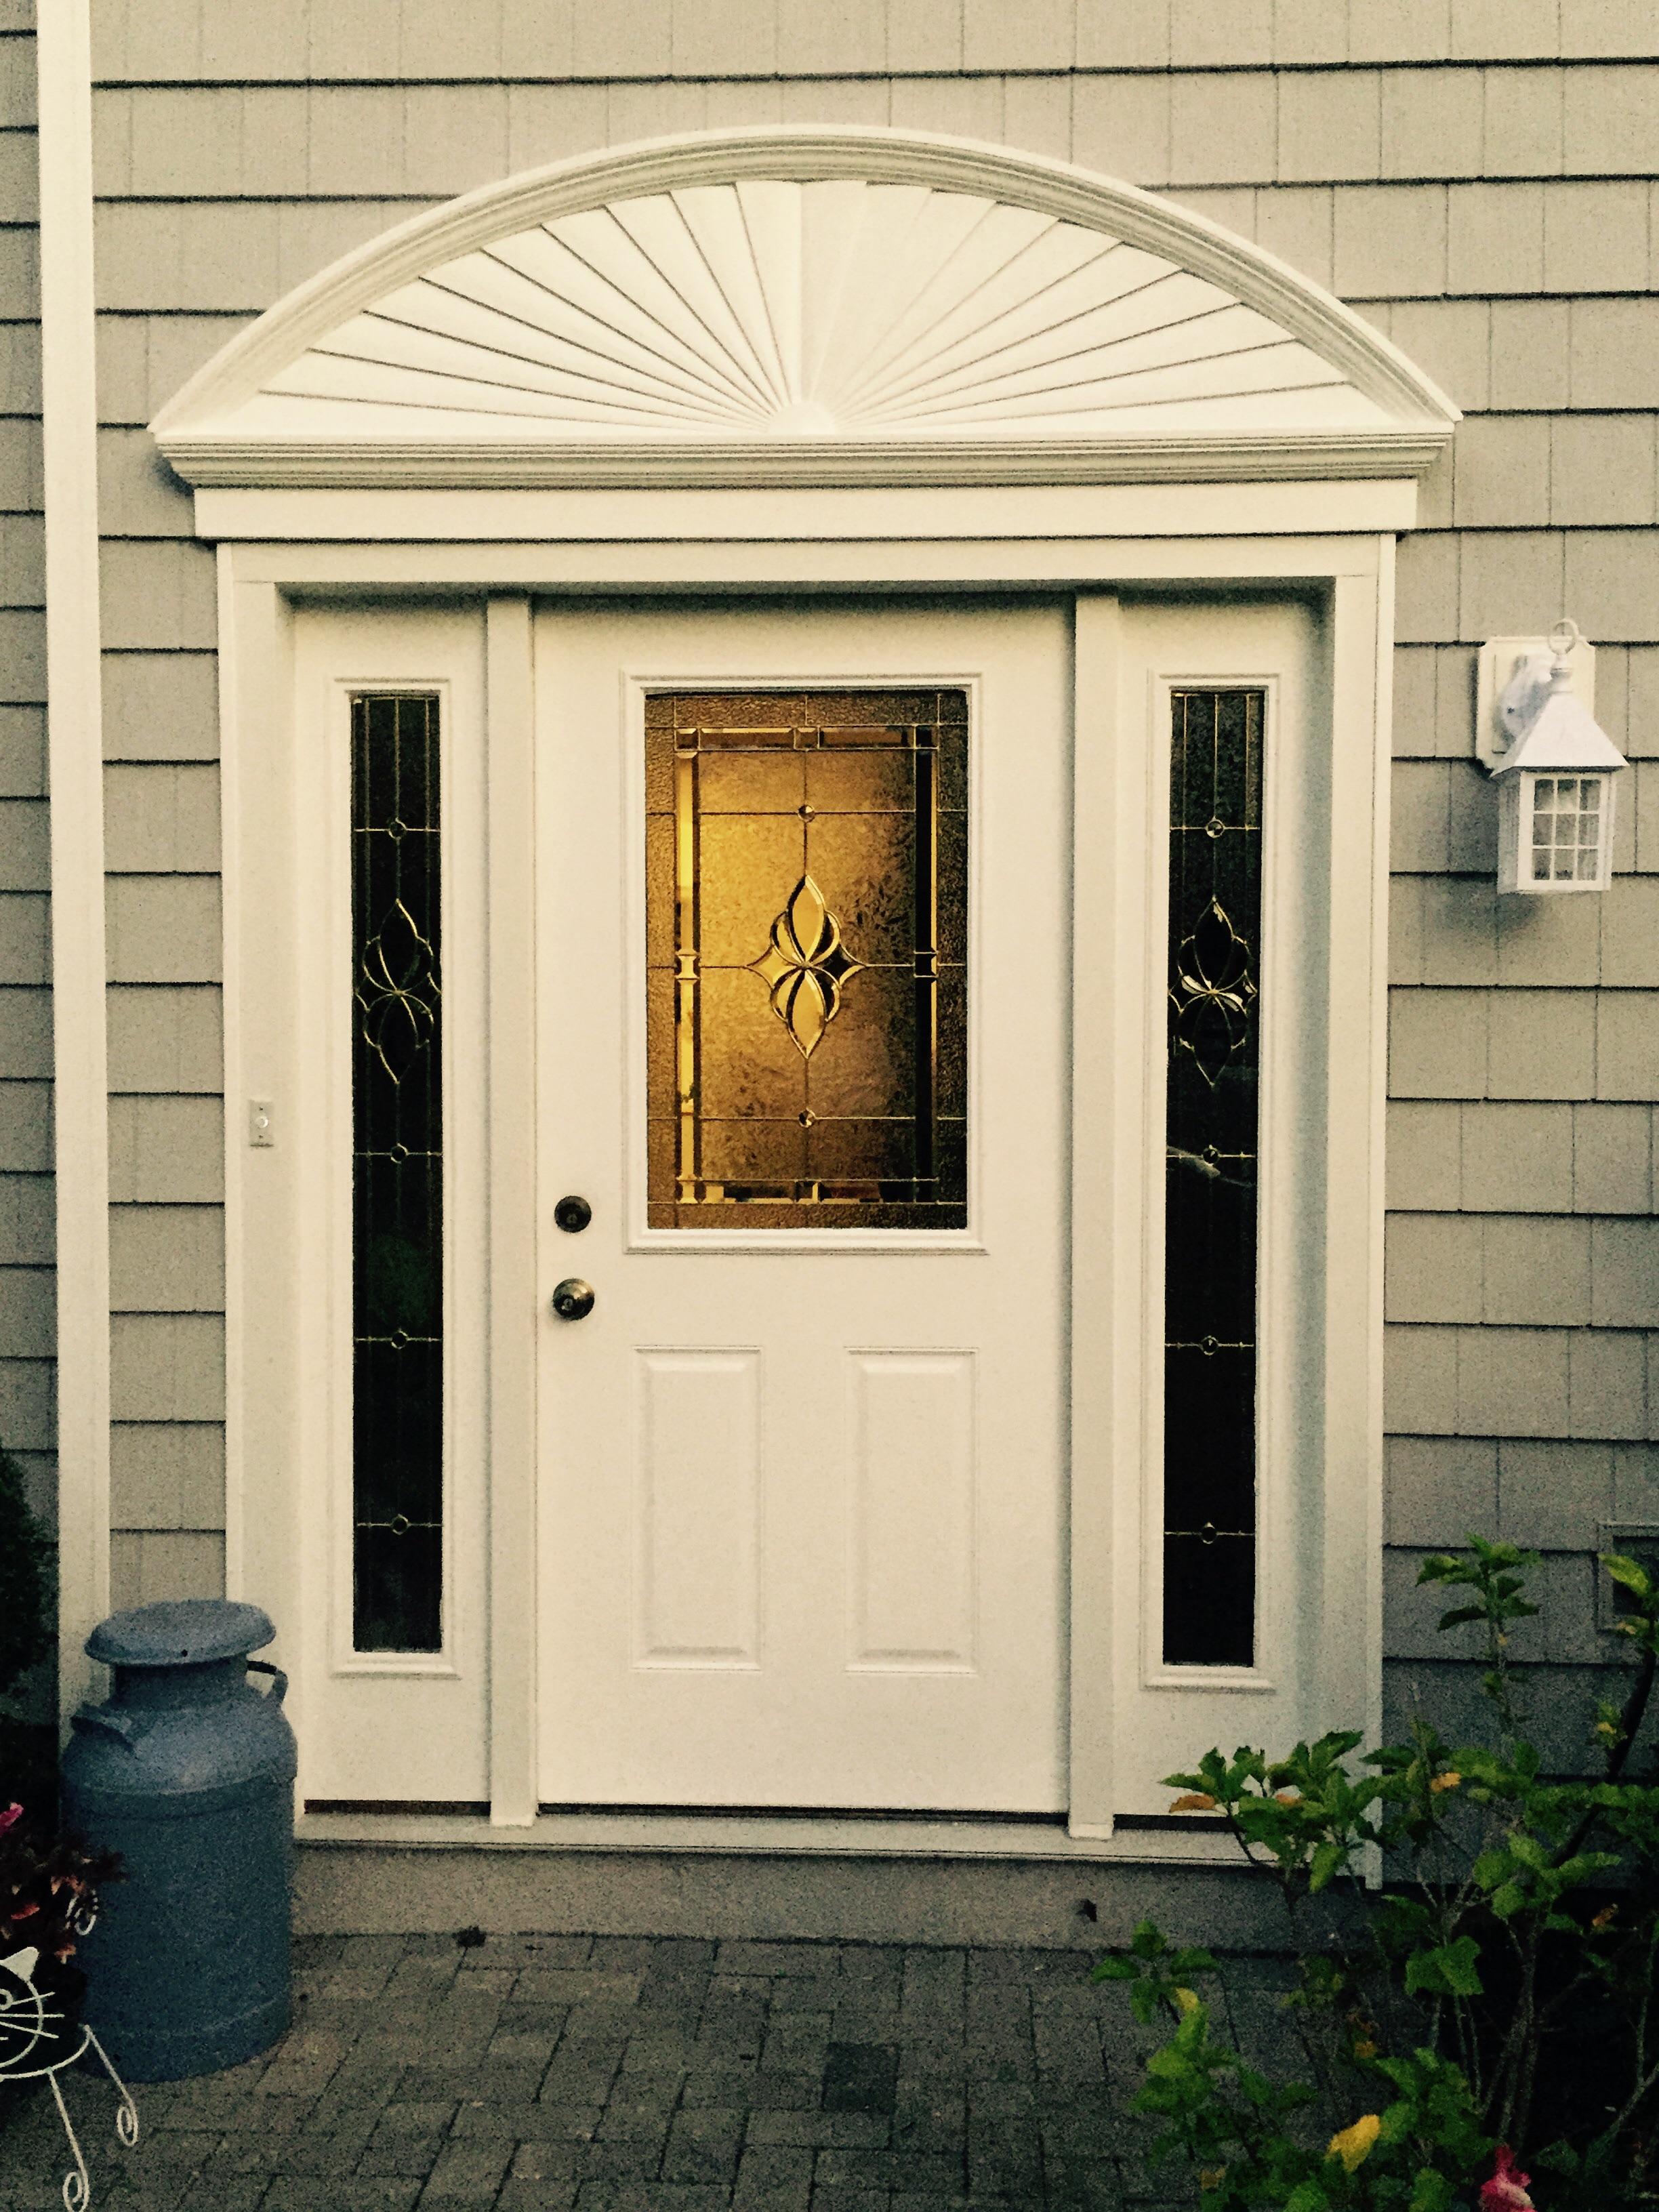 New Shake Siding and Door